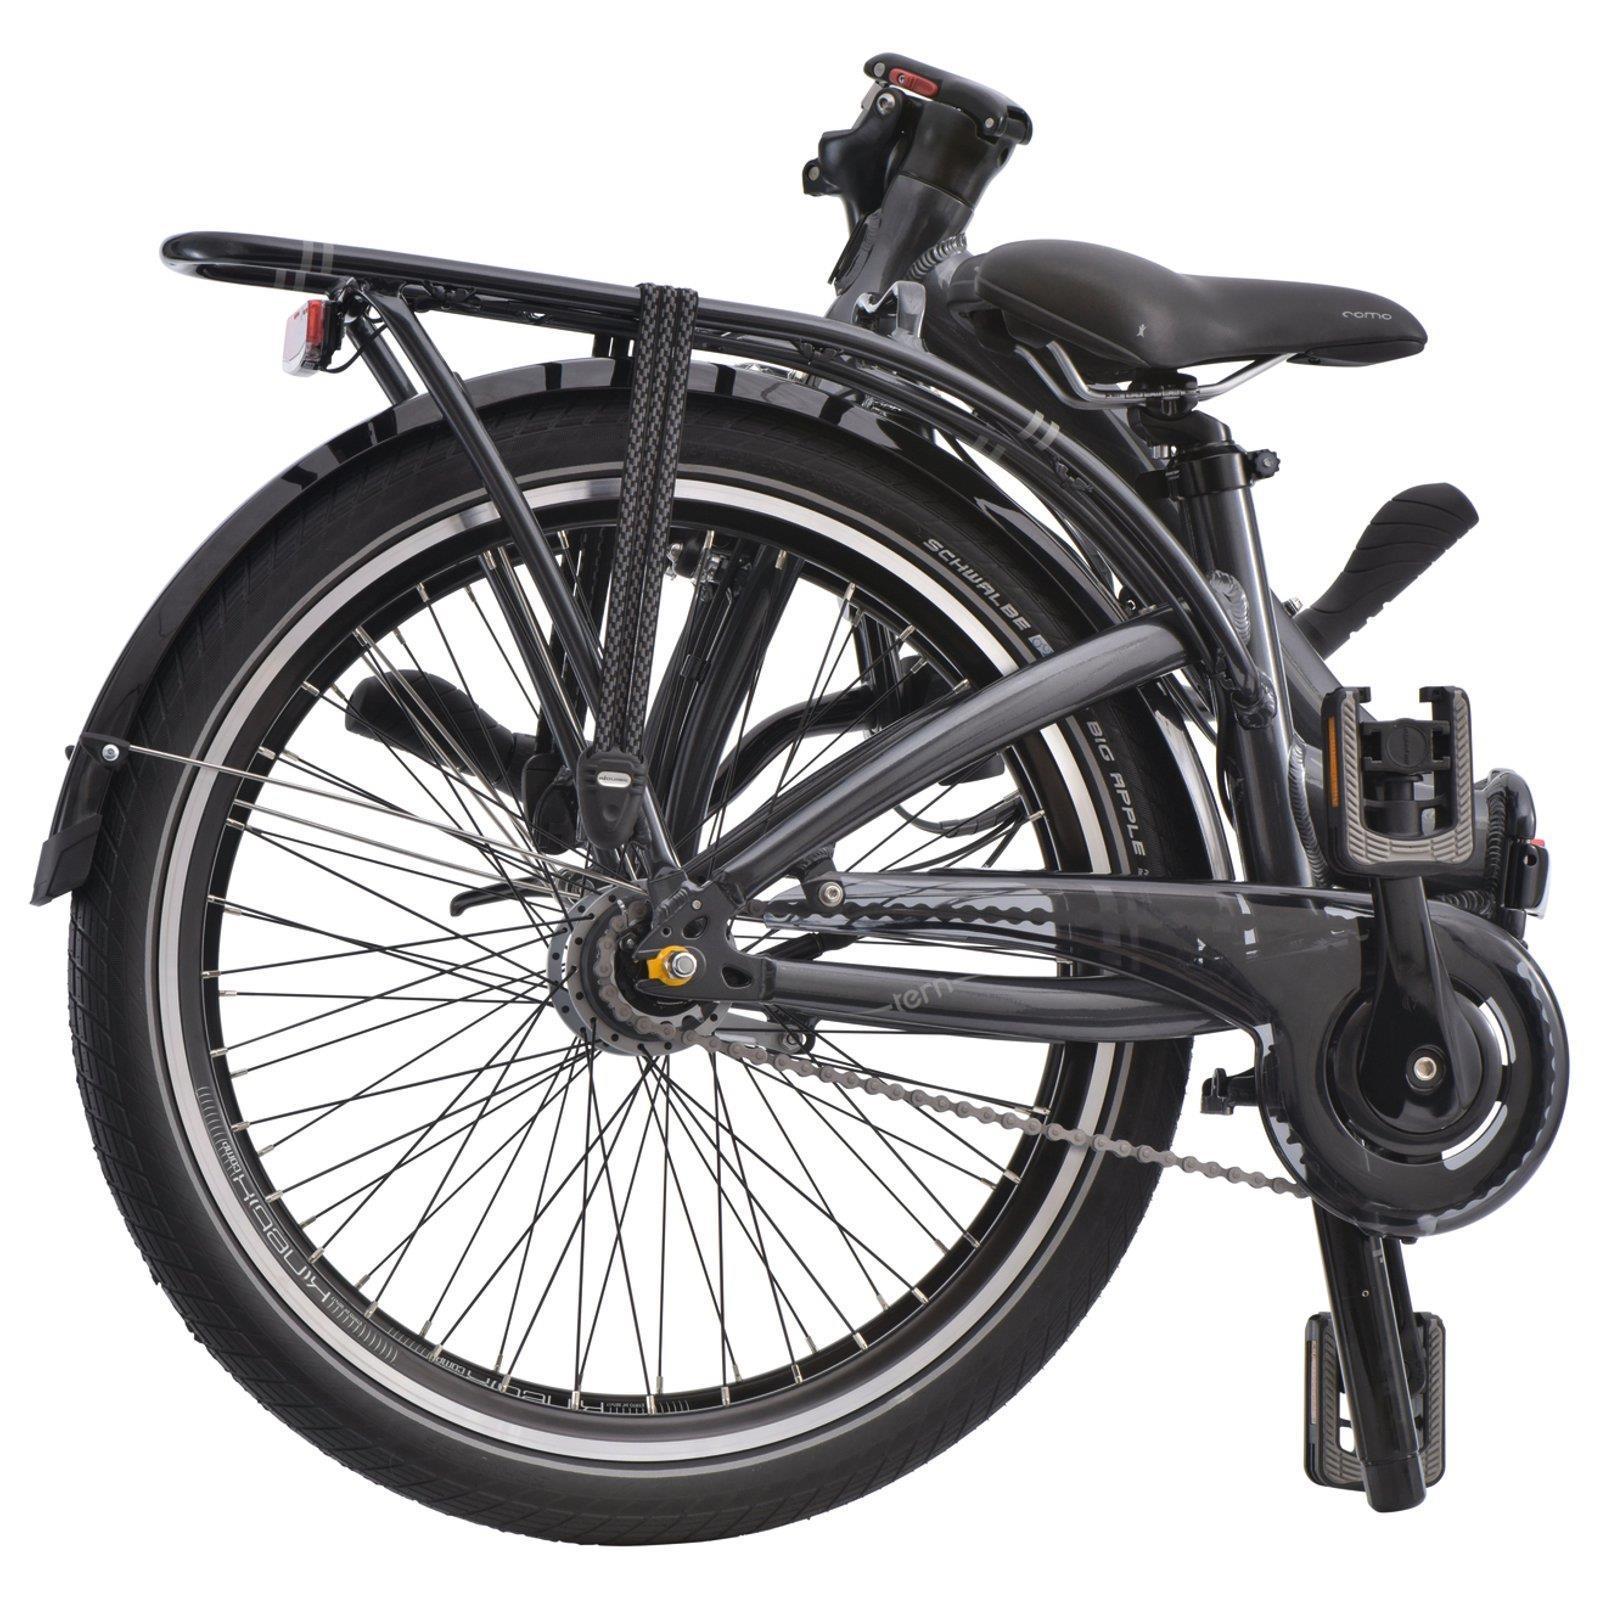 Tern-Faltrad-Castro-P7i-24-034-7-Gang-Klapp-Fahrrad-Faltbar-Aluminium-Gepaecktraeger